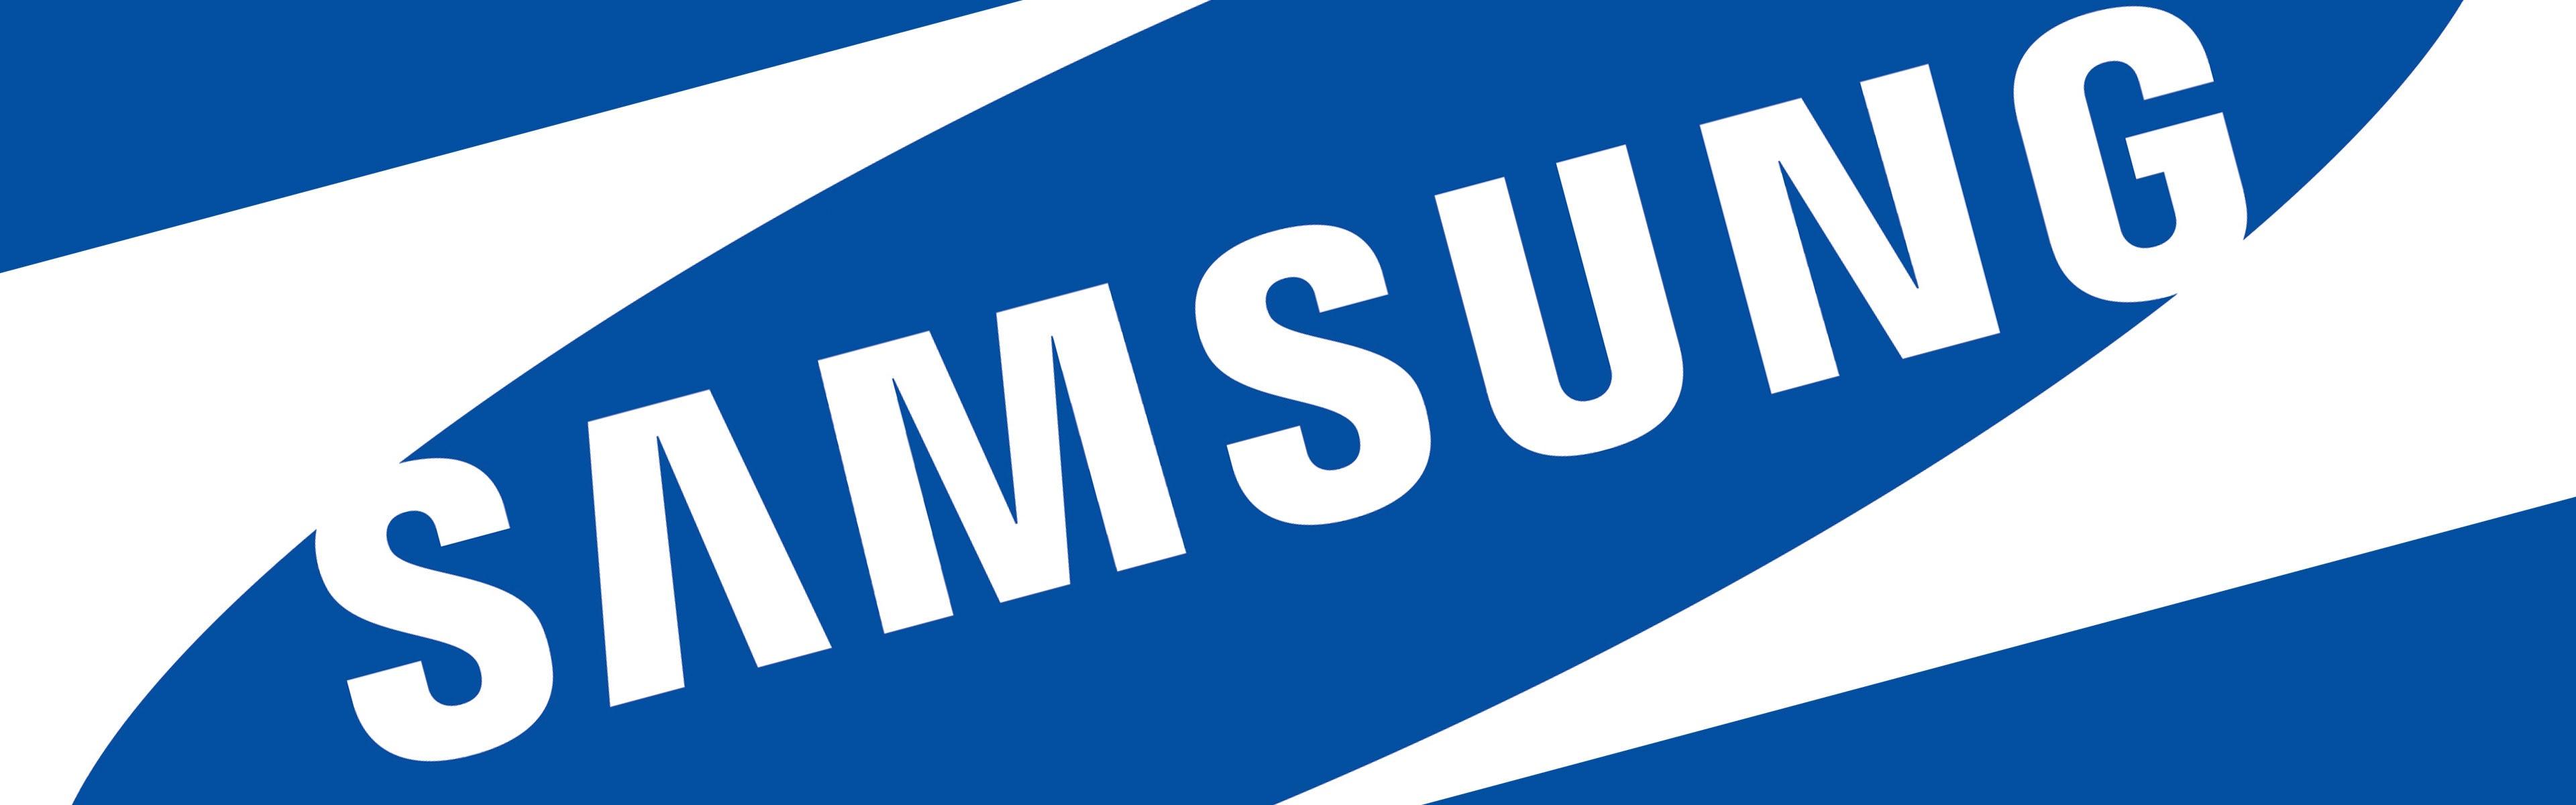 Wallpaper Samsung Logo 3840x2160 Uhd 4k Picture Image